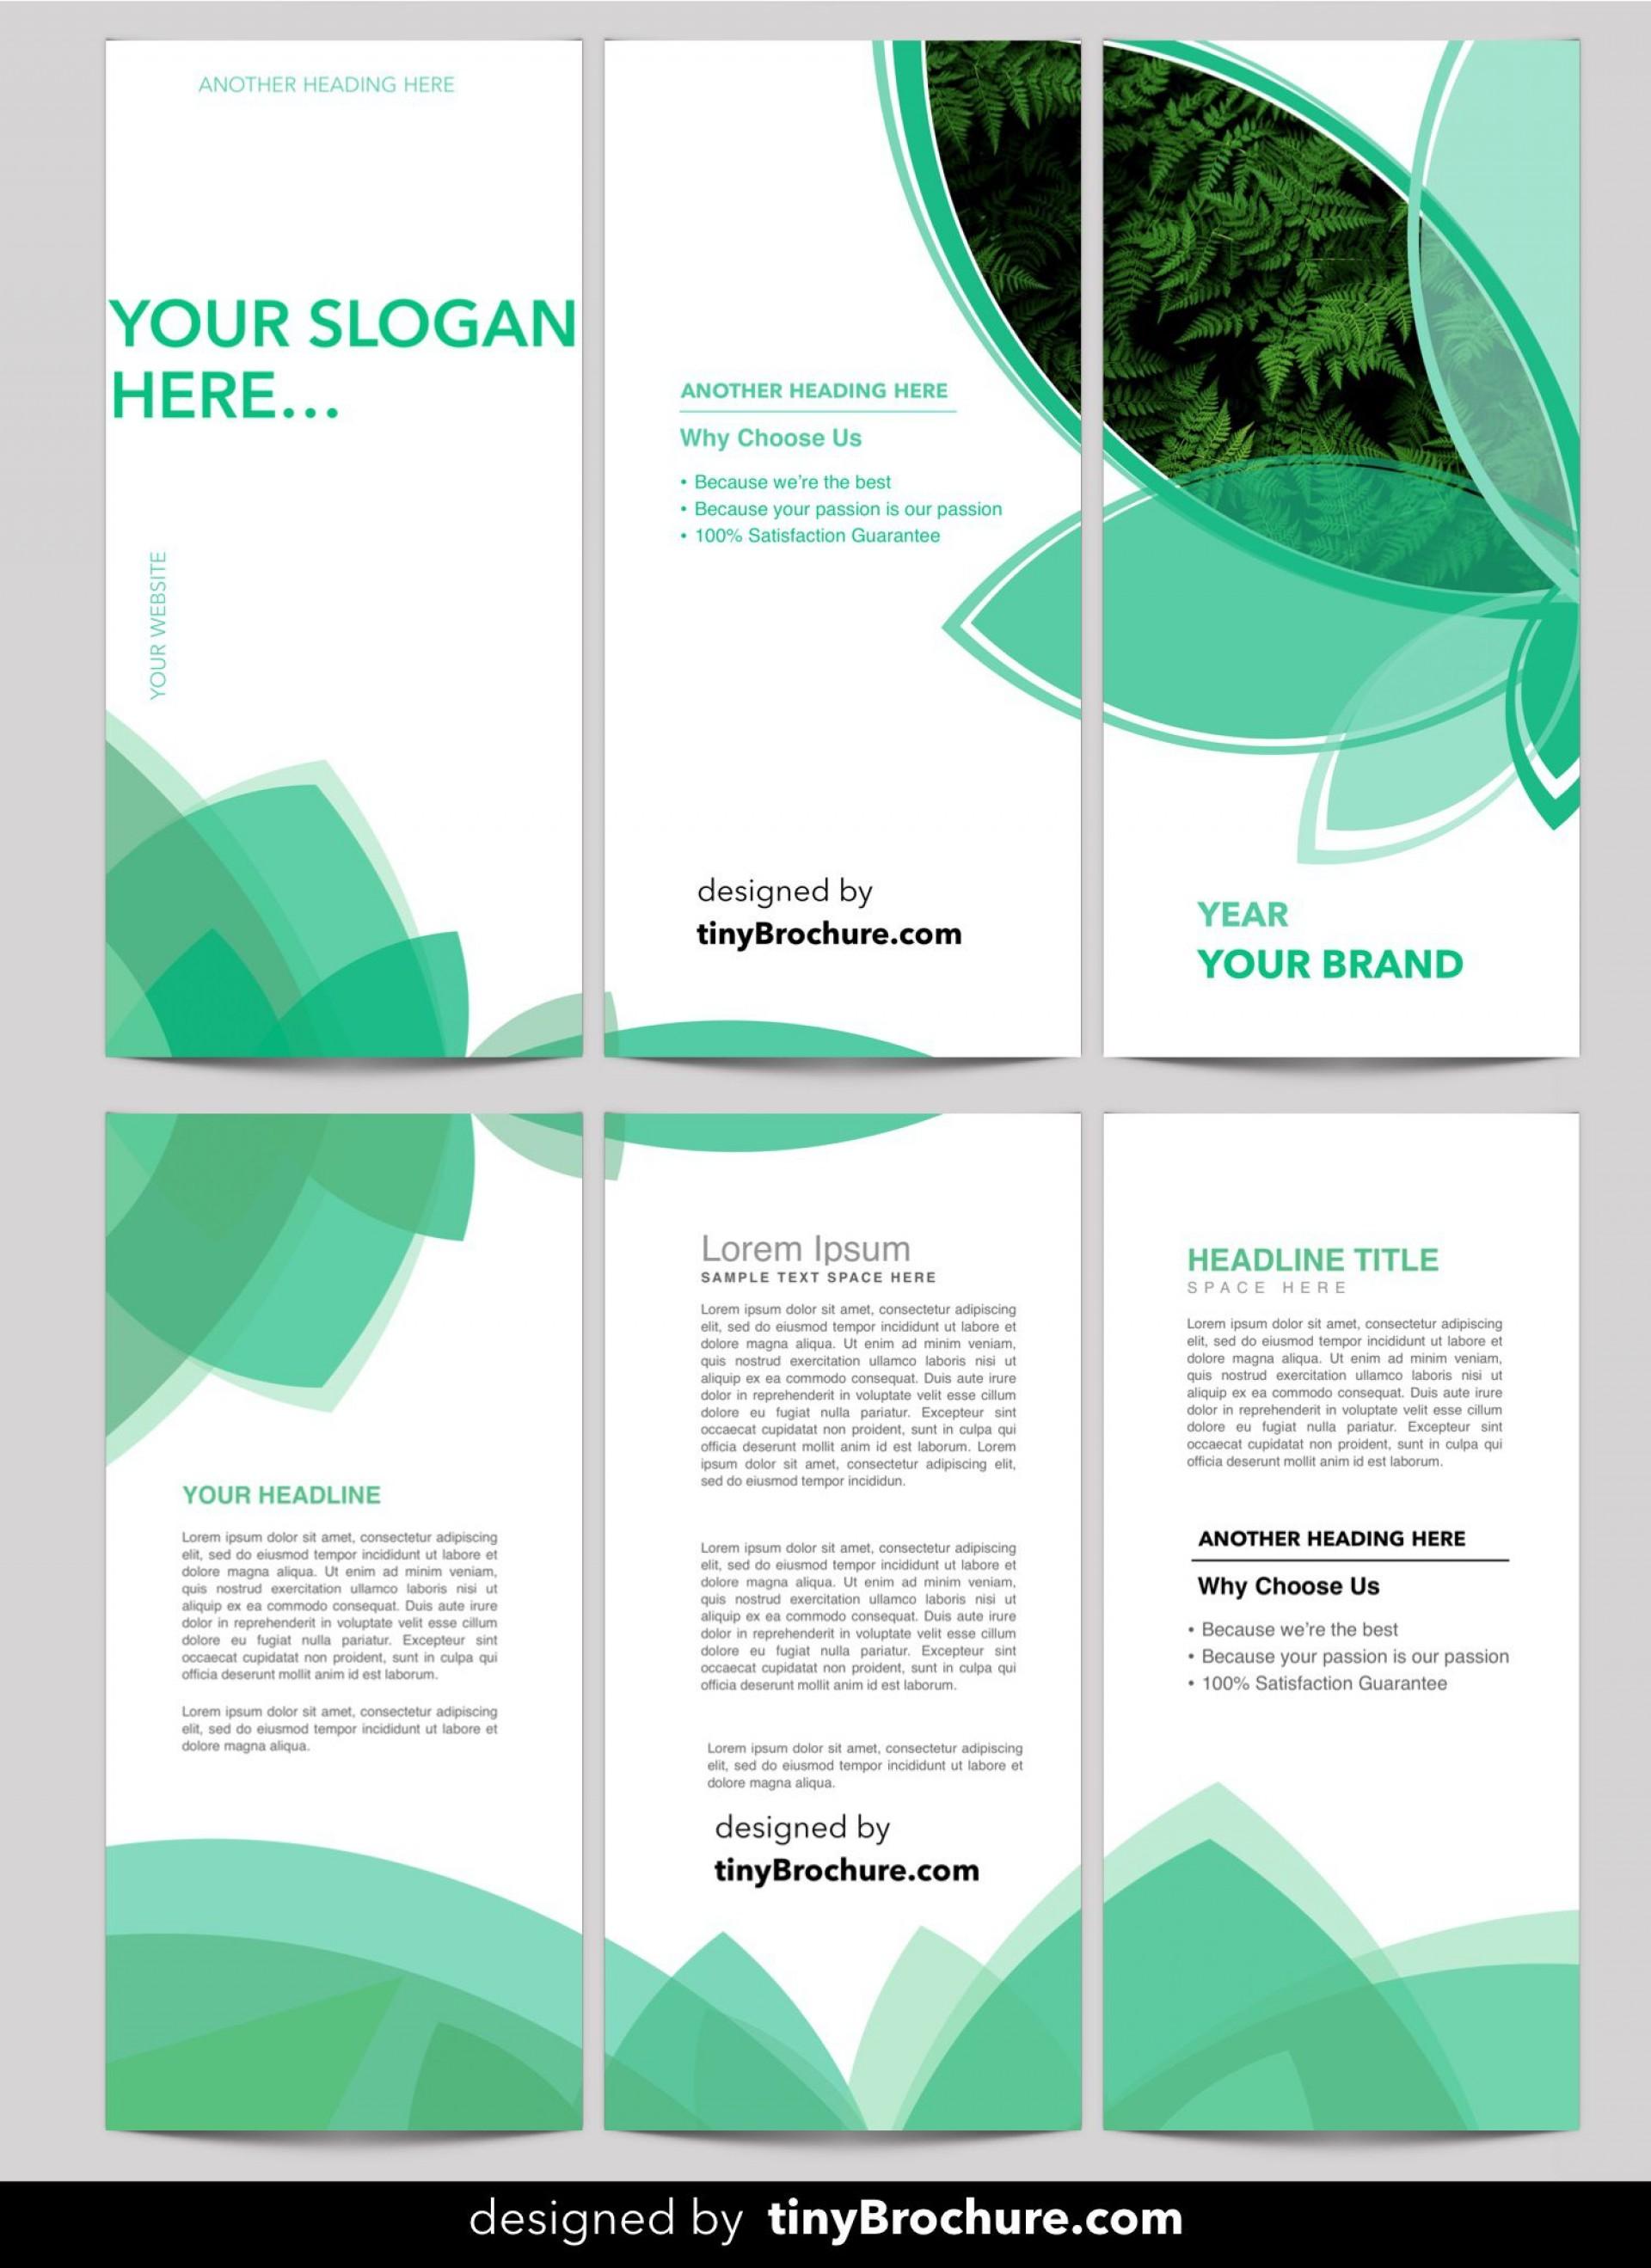 001 Unusual Microsoft Word Brochure Template Image  Templates 2010 Tri Fold A4 2007 Free Download1920